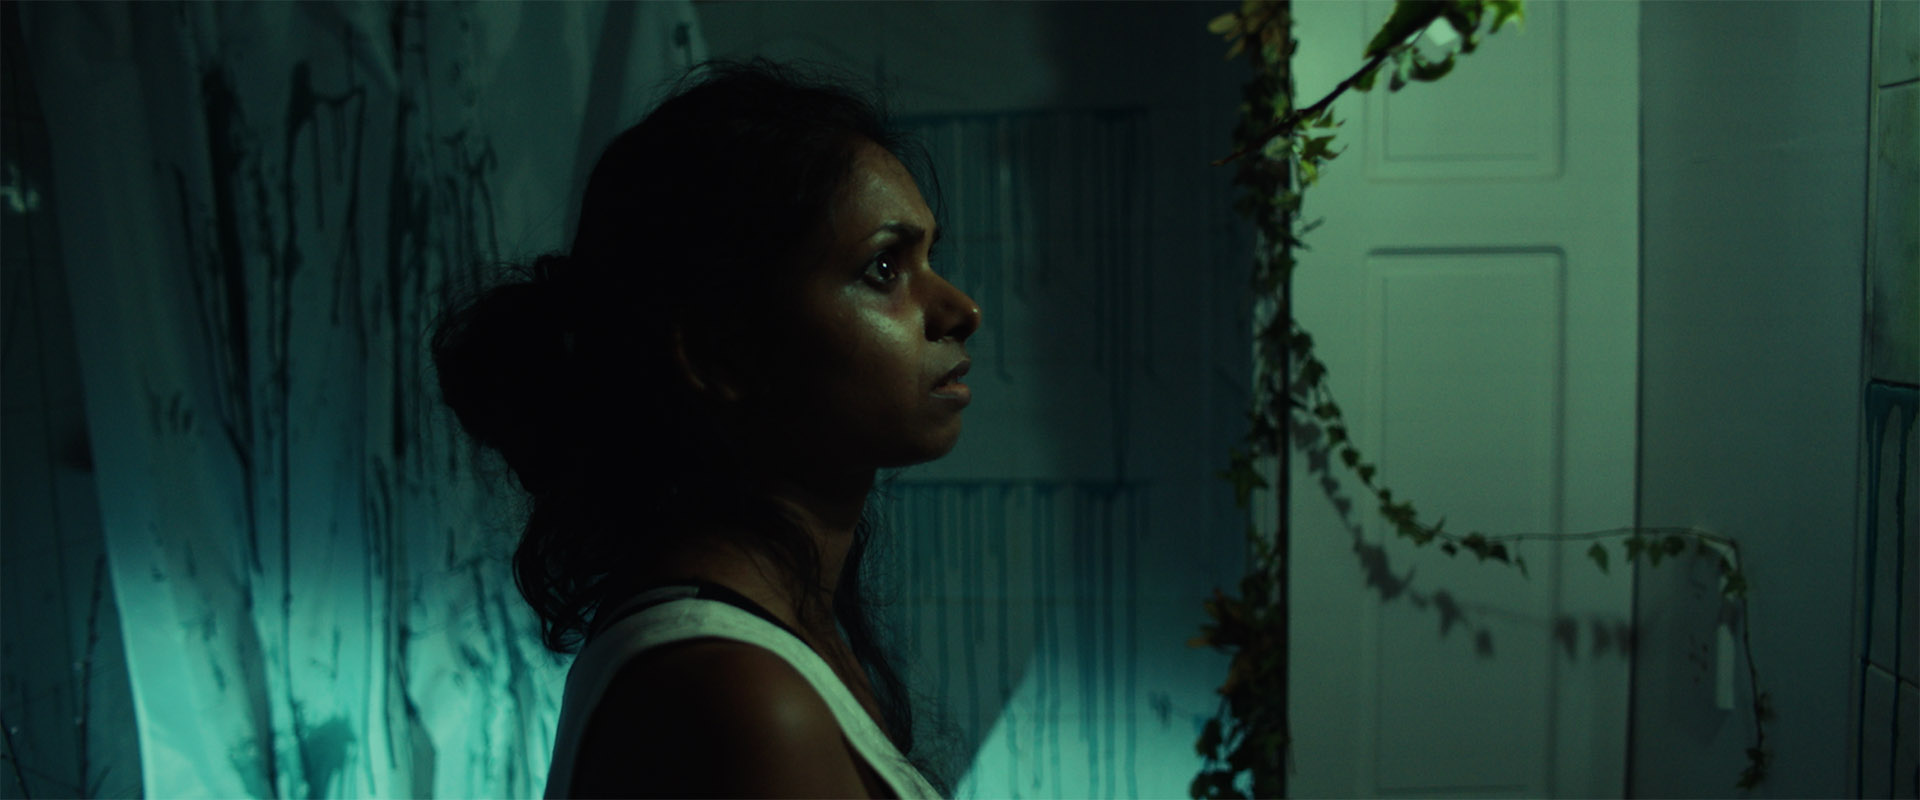 Wilt short horror film Lidia Molina Whyte abusive relationship flower symbolism feminist